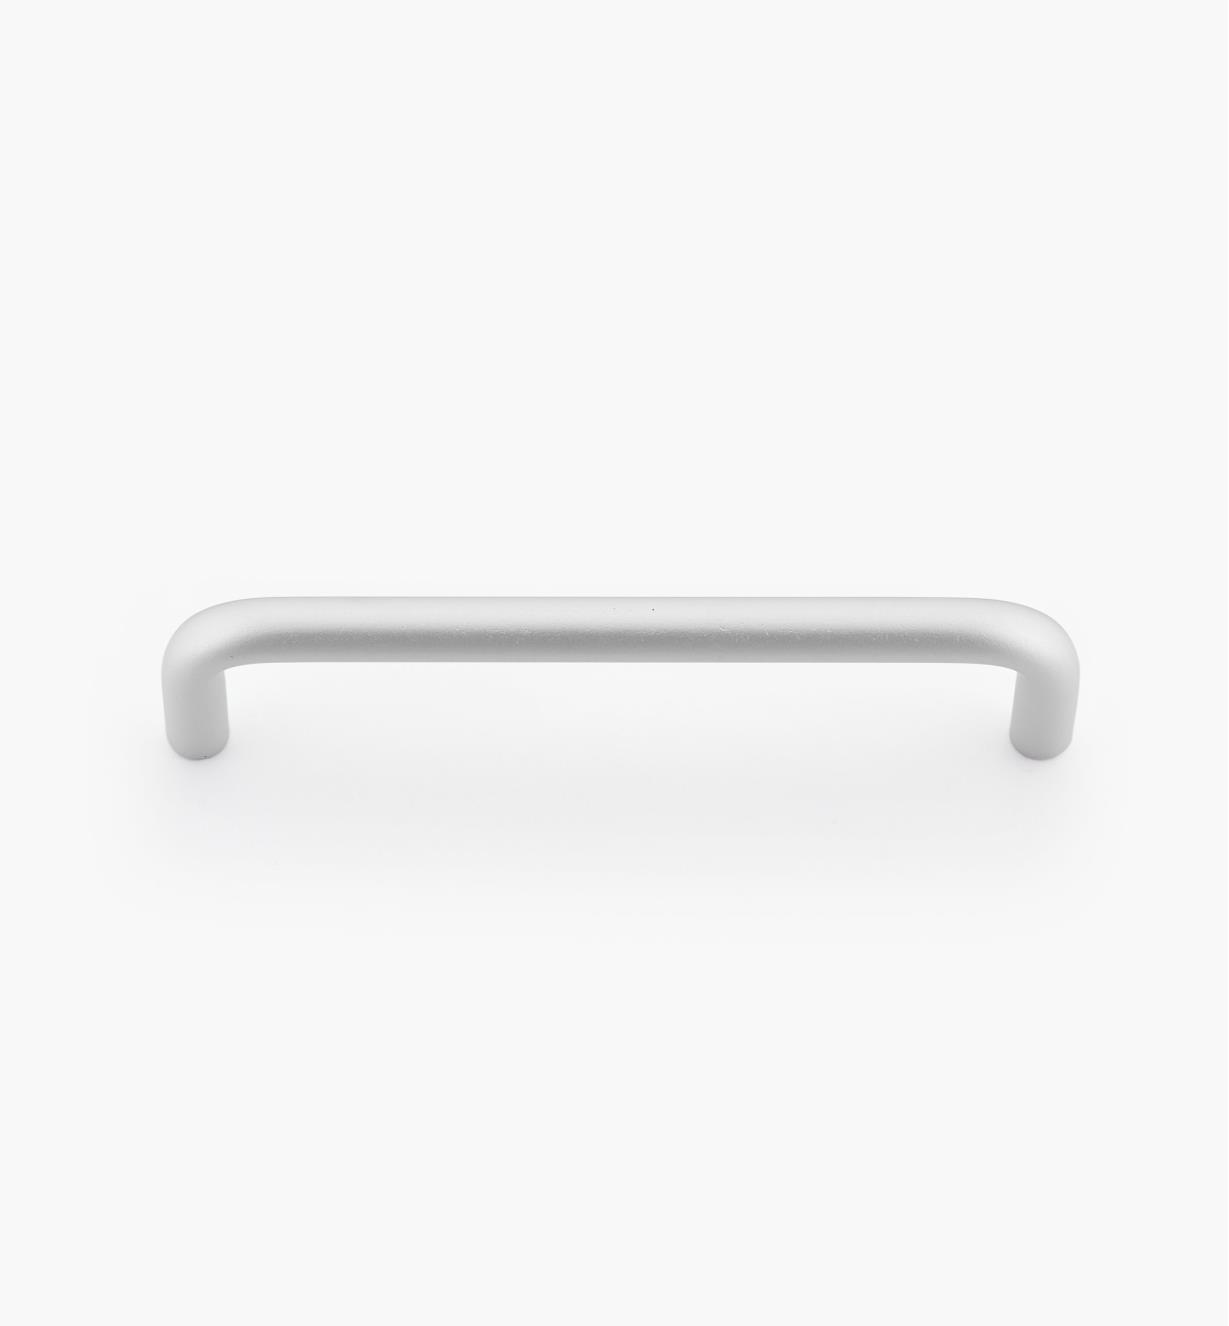 01W7604 - Poignée-fil moderne, aluminium satiné, 4po